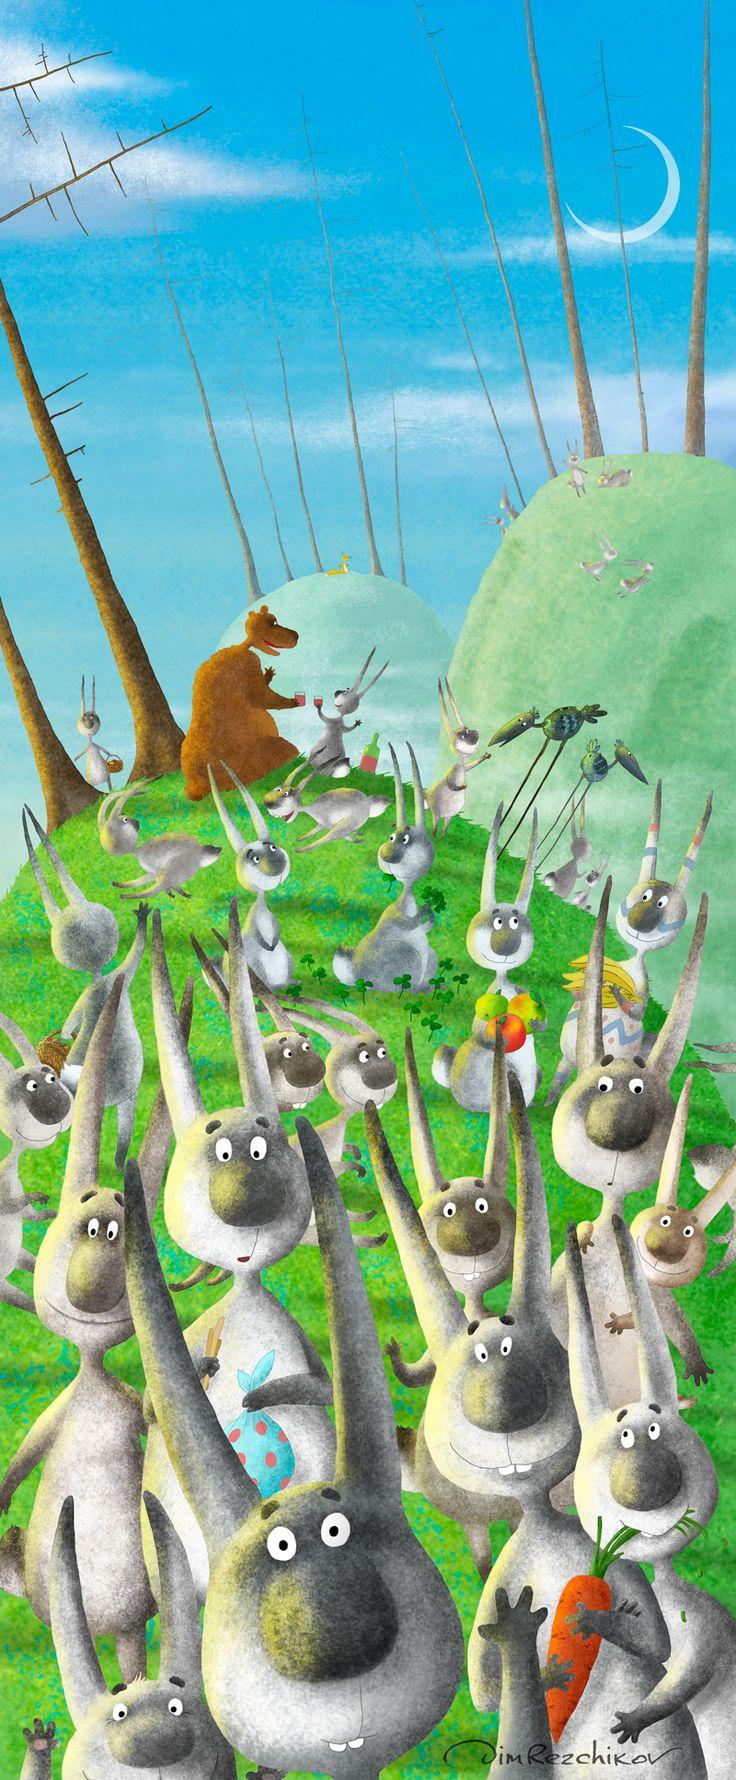 Бес зайцев  Bunny spirit  art • russian • illustration • calendar • drawing • artist • illustrator • fantasy • spring • hare • bunny